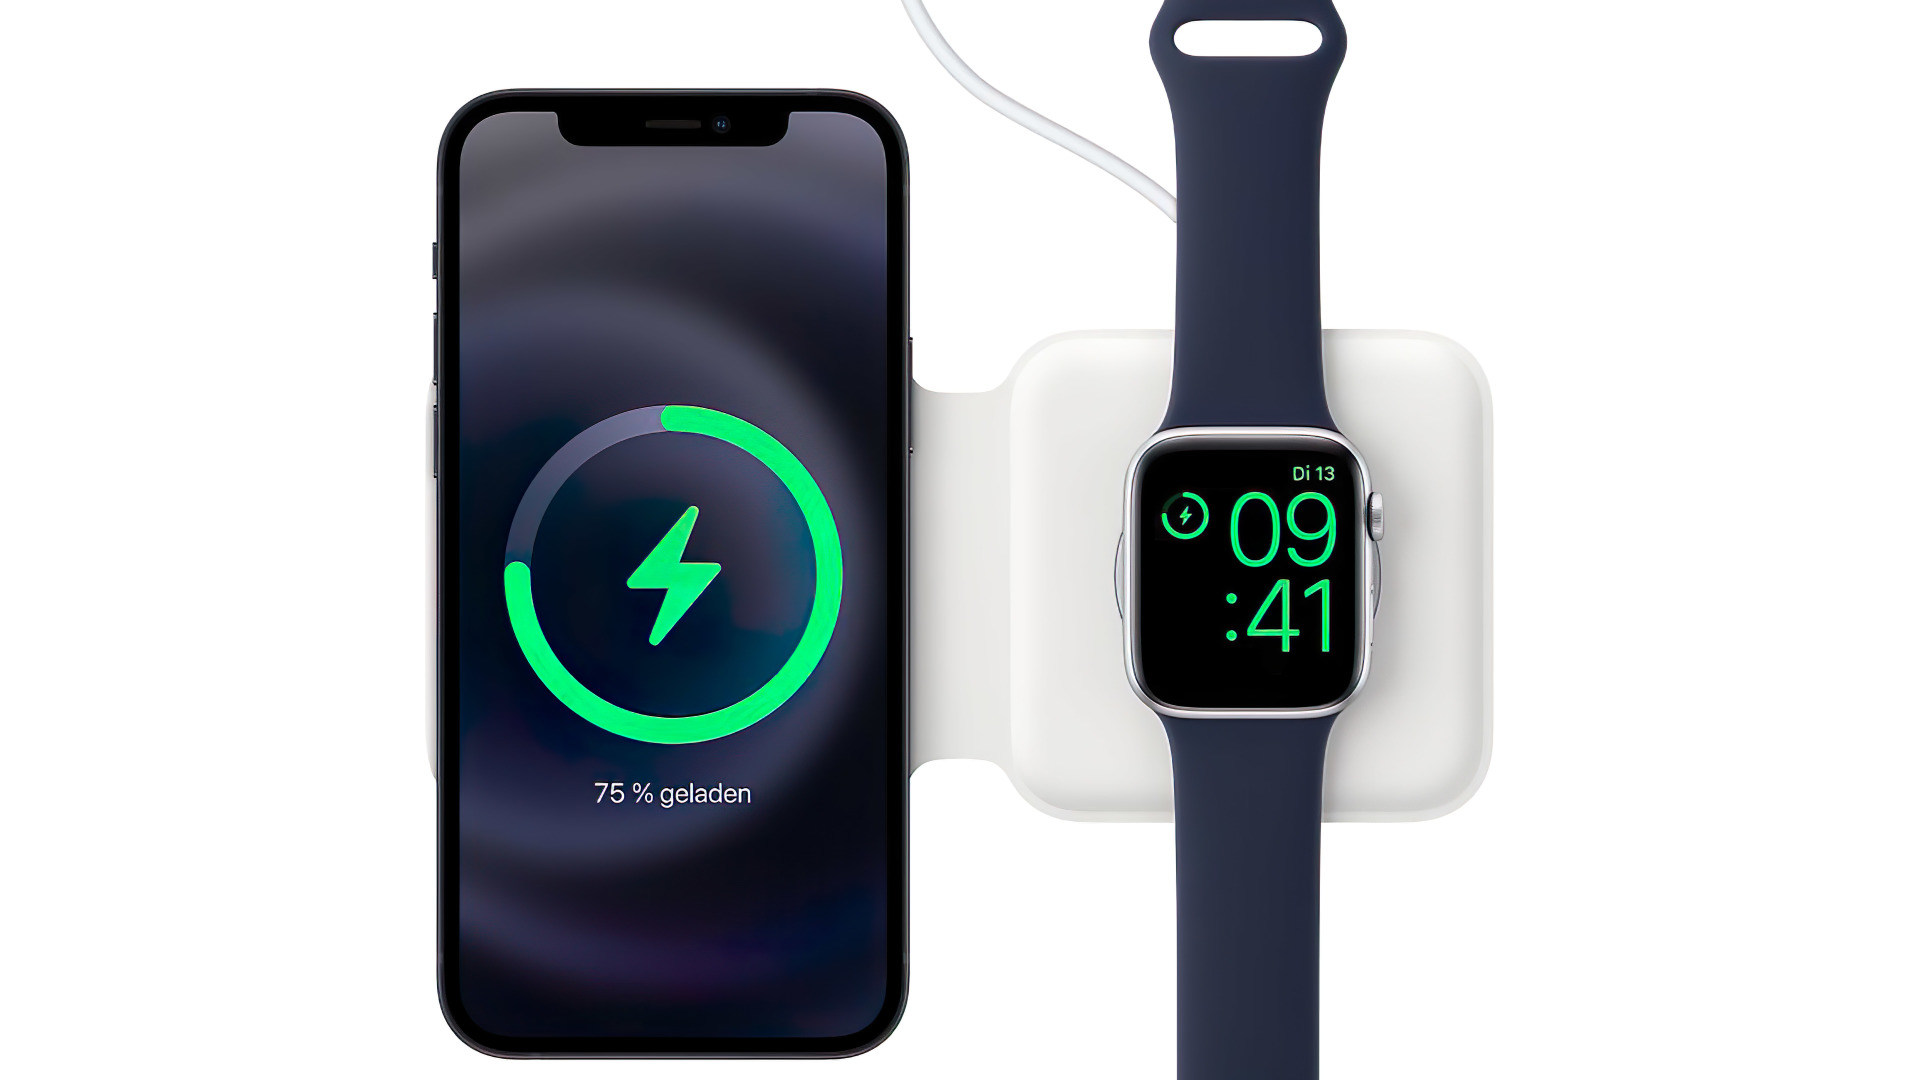 Apple, Iphone, Anschluss, Ladegerät, Netzteil, Ladekabel, MagSafe Duo Ladegerät